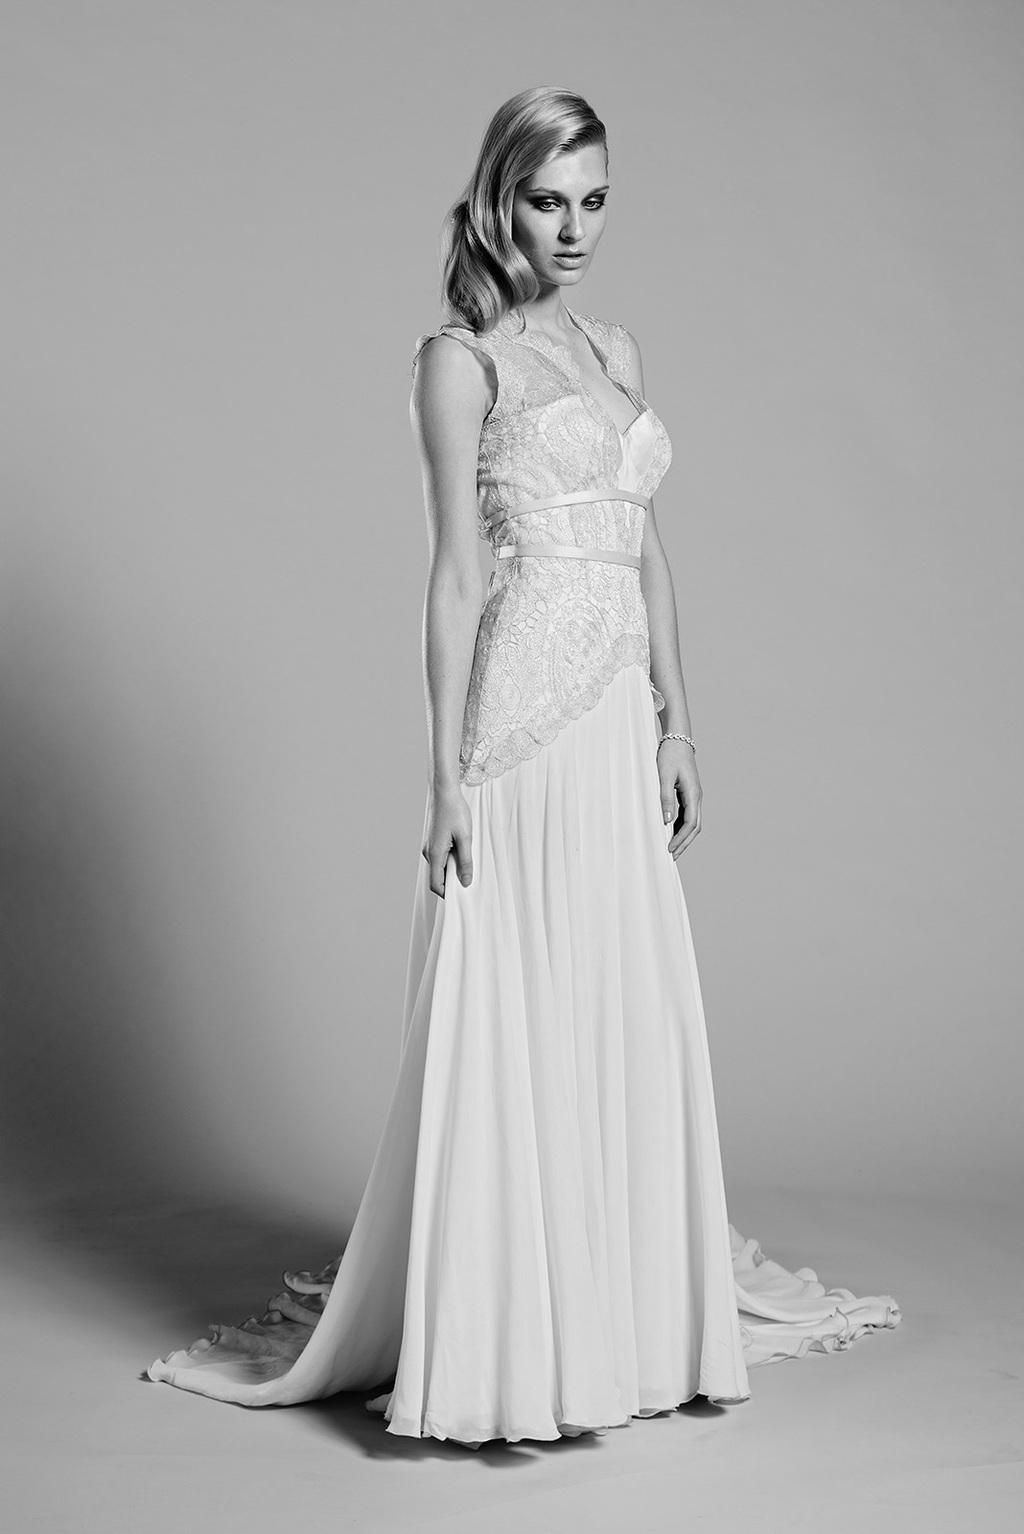 lilac wedding dress by mariana hardwick bridal lilac wedding dress Lilac wedding dress by Mariana Hardwick bridal